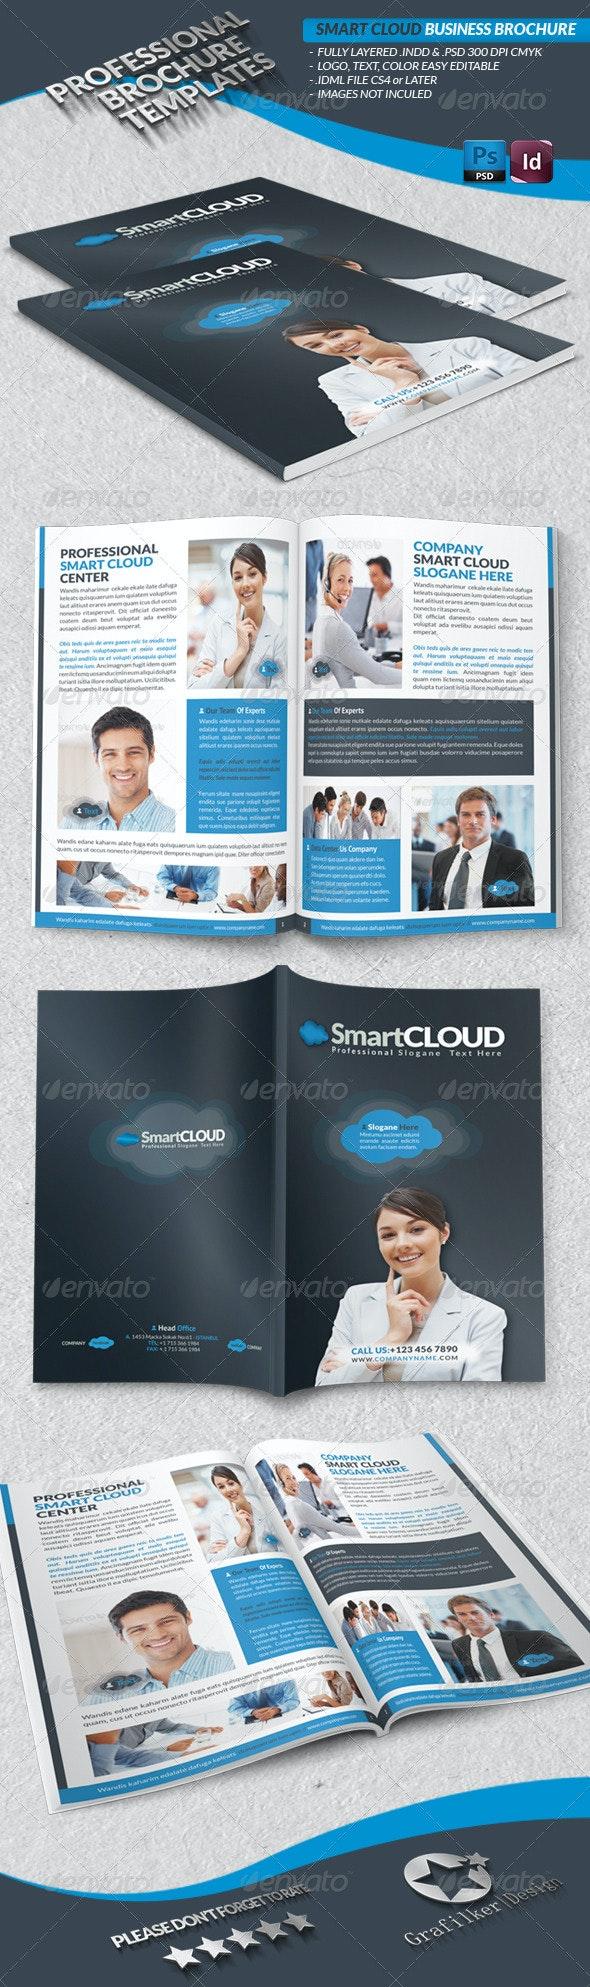 Smart Cloud Business Brochure - Brochures Print Templates